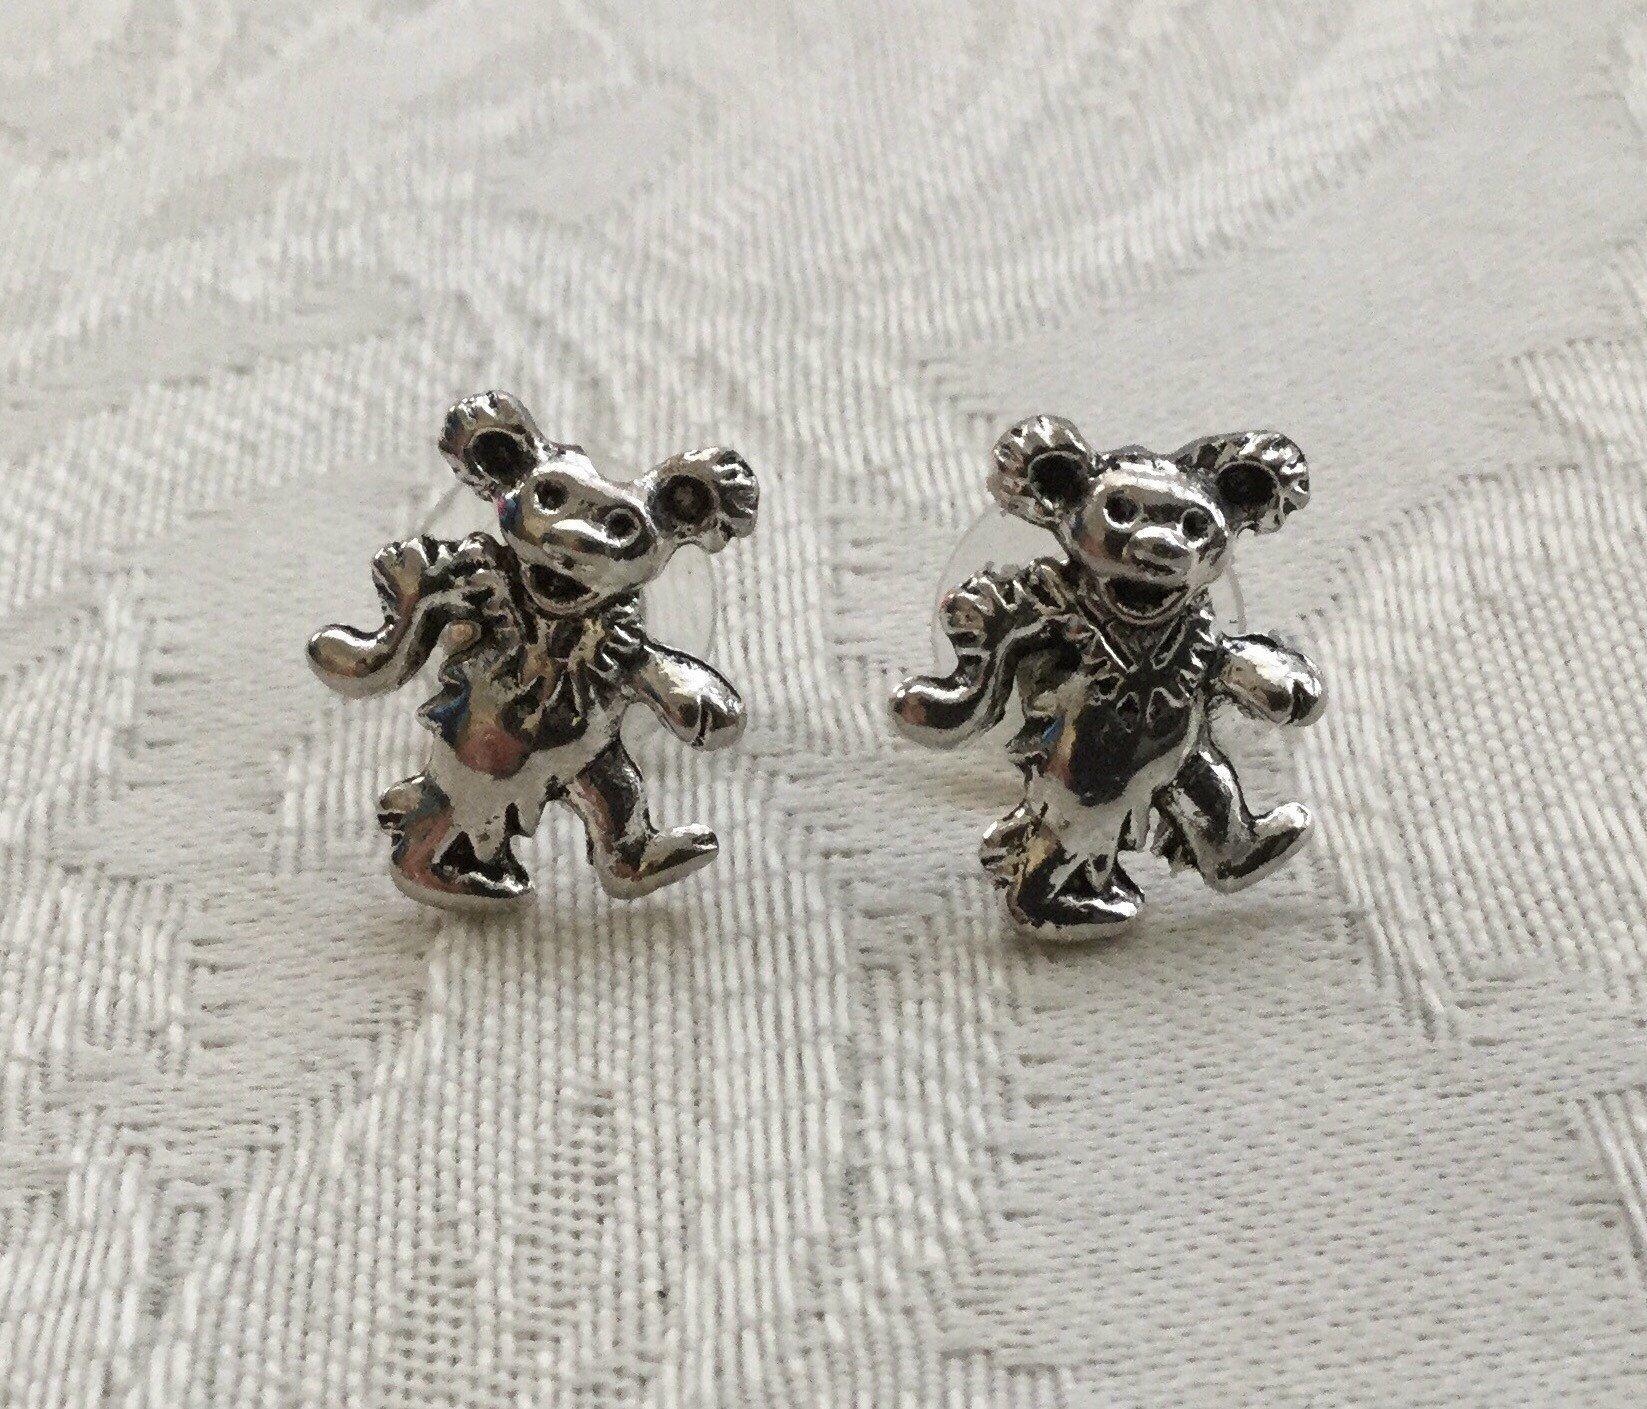 brown bear animal earrings honeybear bear errings animal jewelry mountain bear gift for her grizzly bear bear jewelry